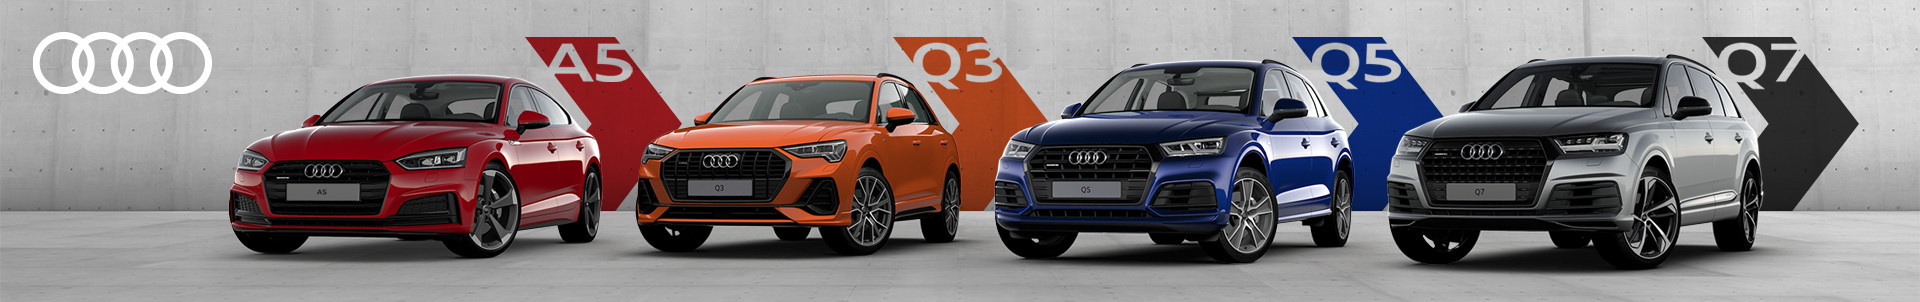 Specjalne ceny na samochody Audi 1